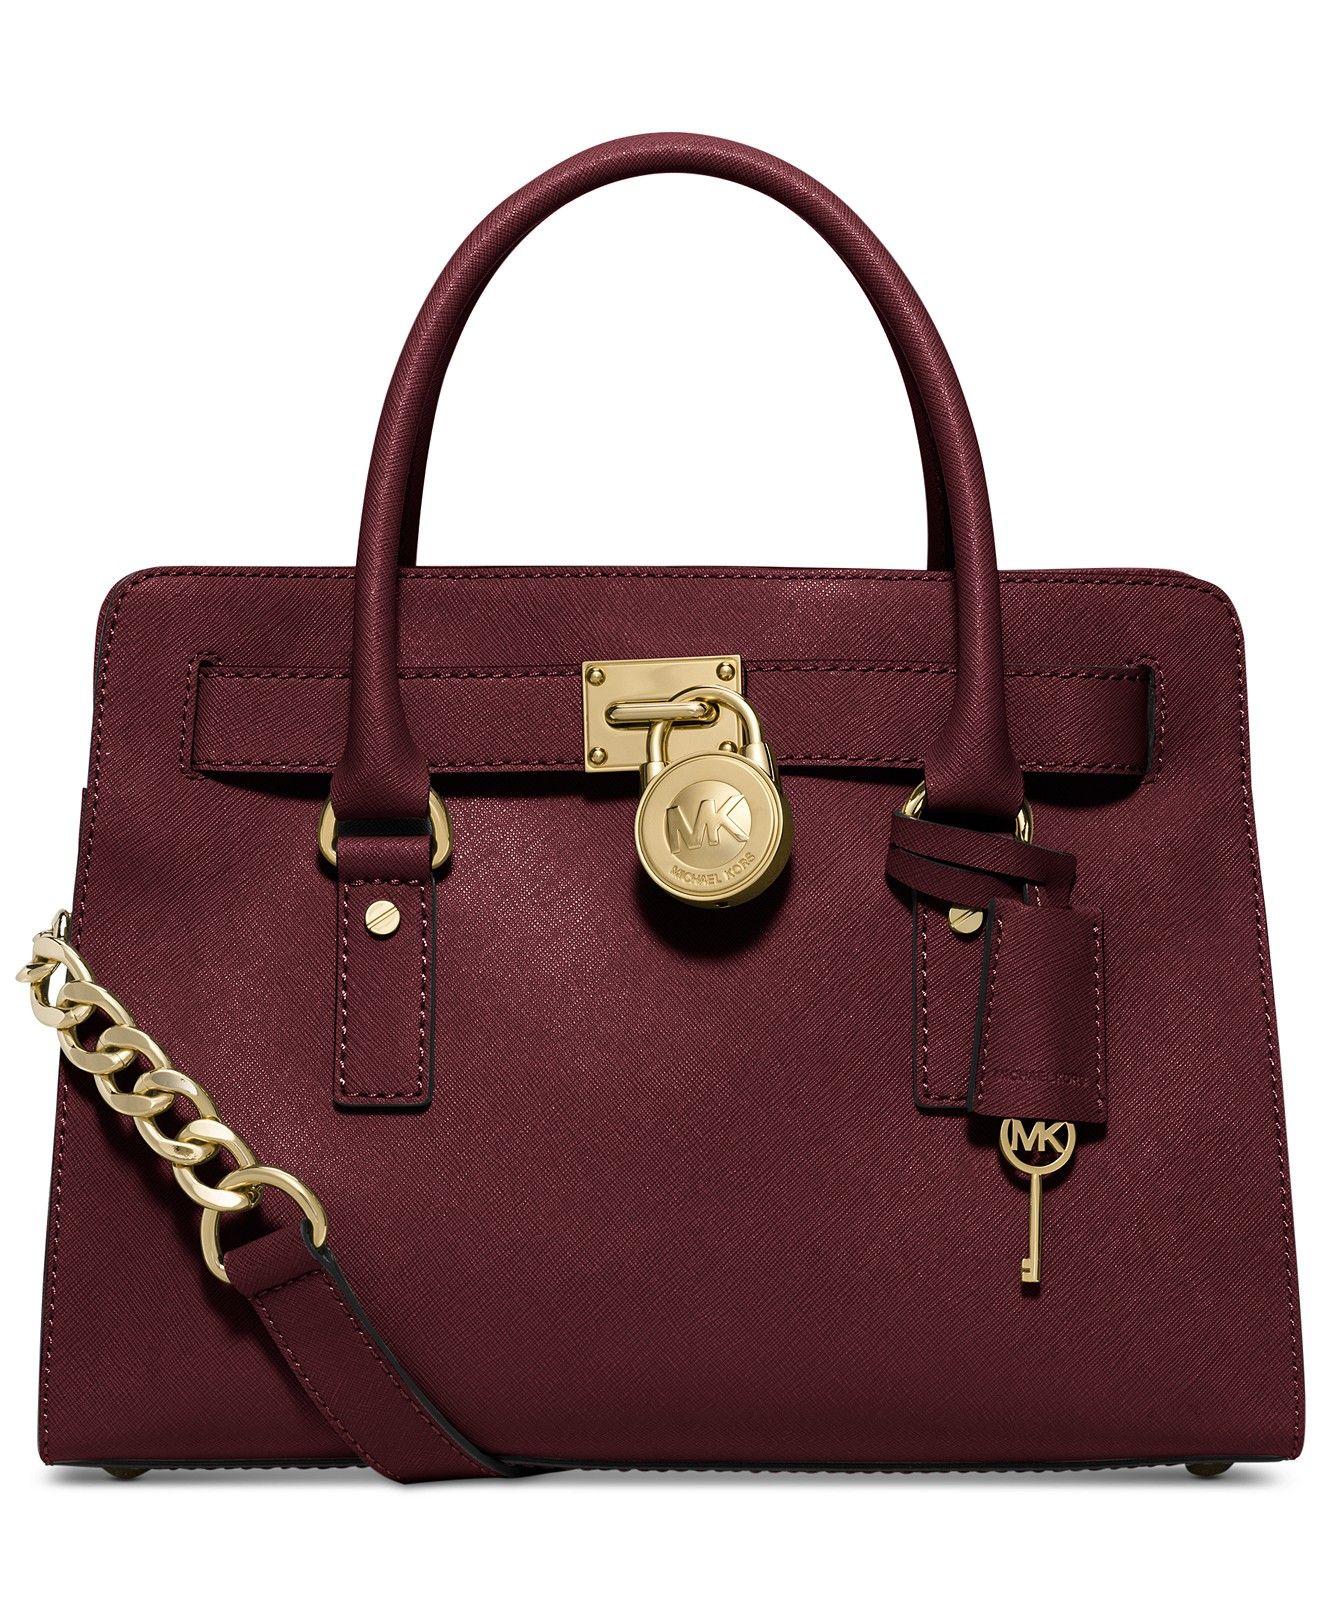 f74a77482537 MICHAEL Michael Kors Hamilton Saffiano Leather East West Satchel - Michael  Kors Handbags - Handbags   Accessories - Macy s